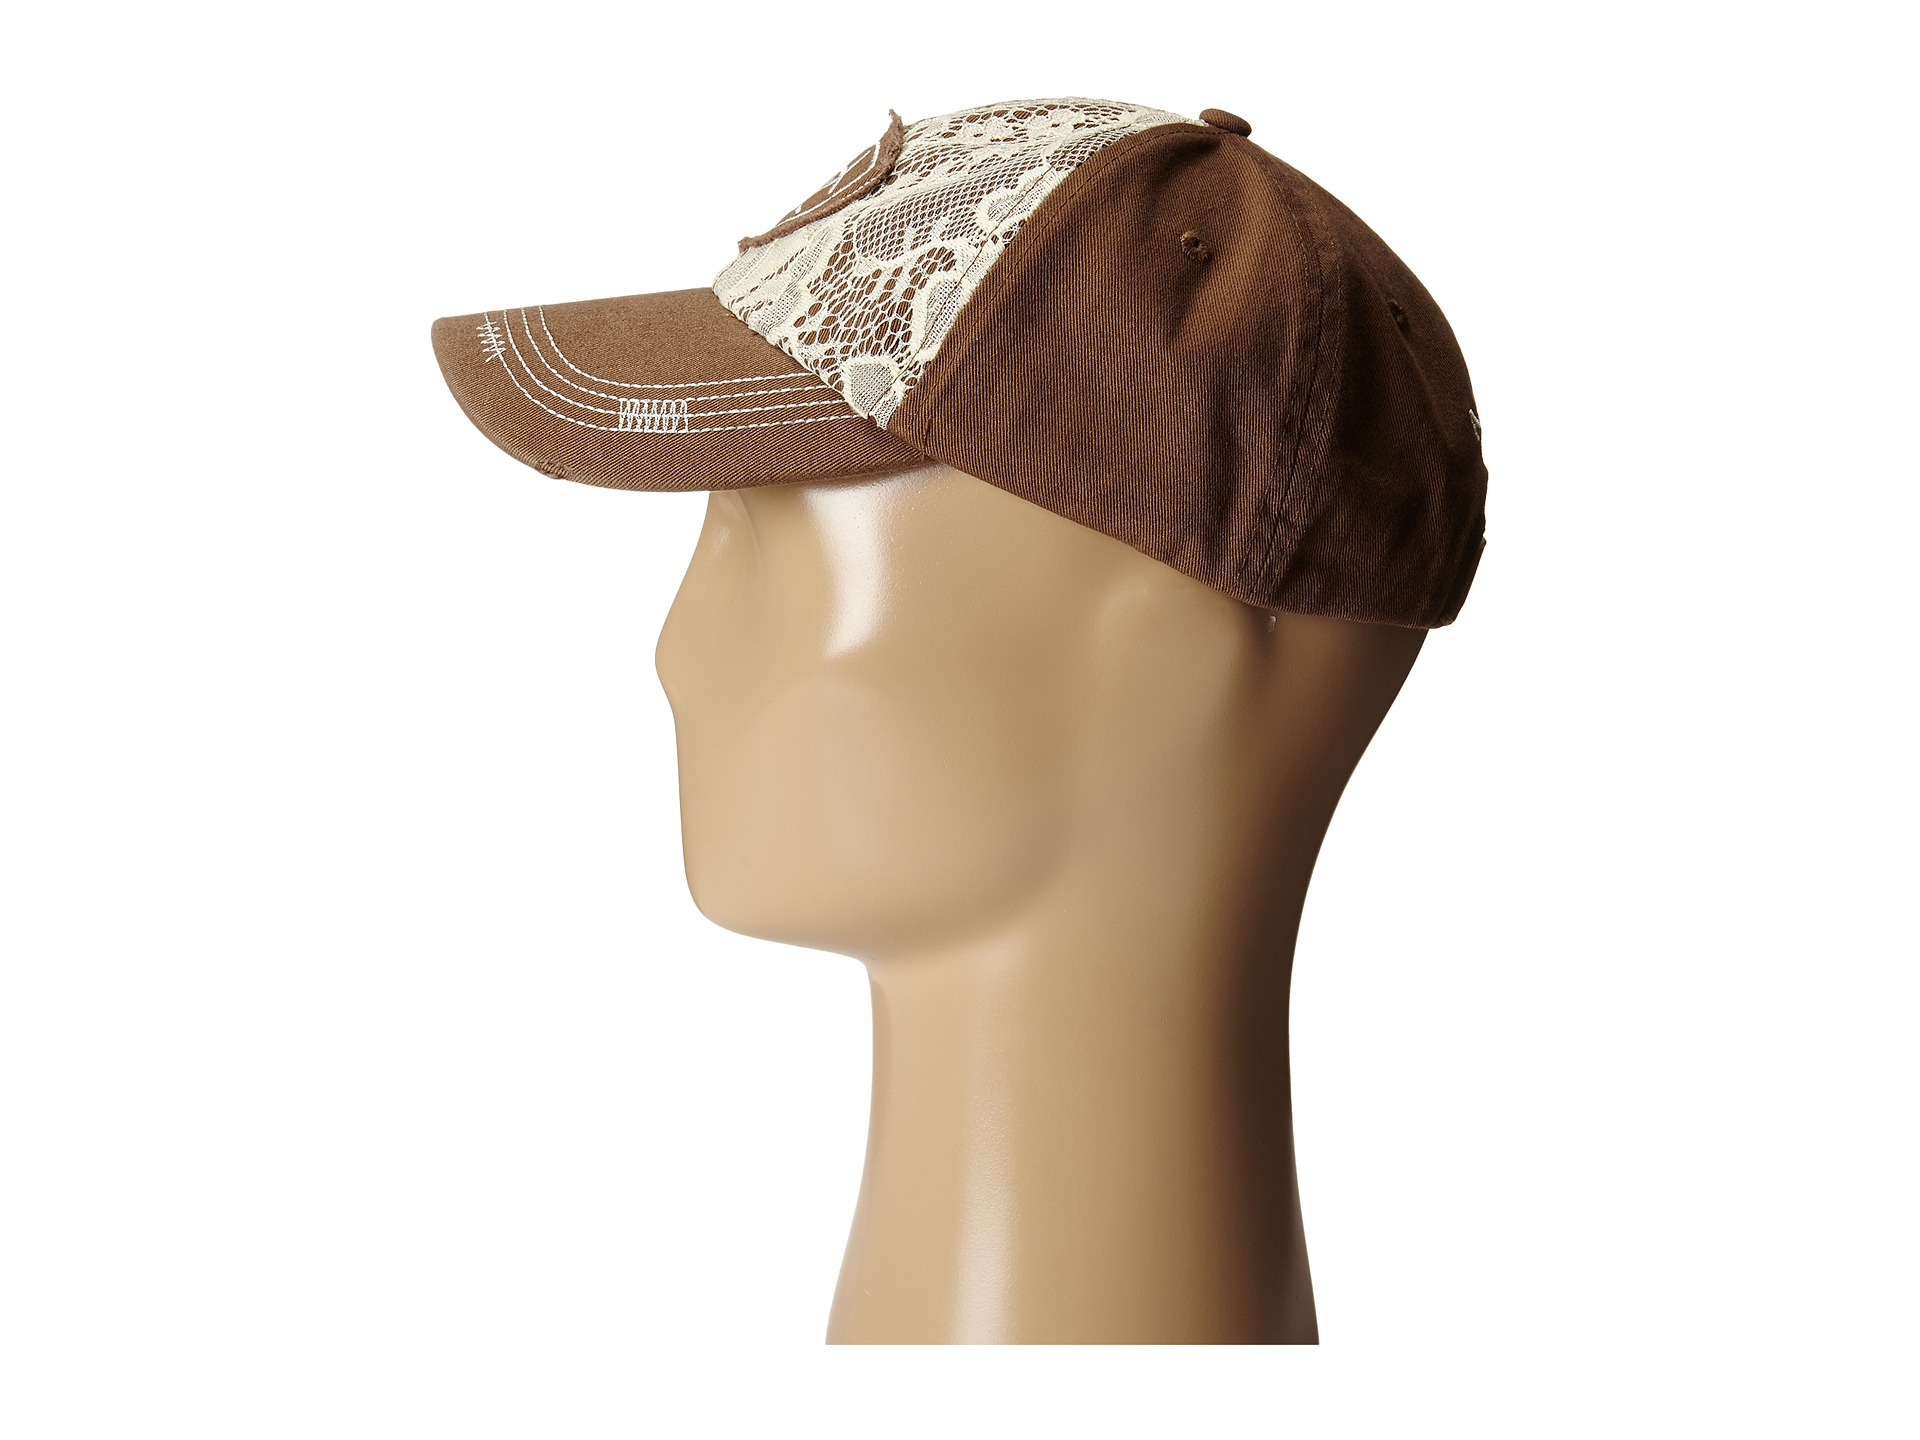 eea52ffa4cd ... sweden lyst ariat lace shield logo cap in brown 48afa a3b22 shop ariat  hat womens ...